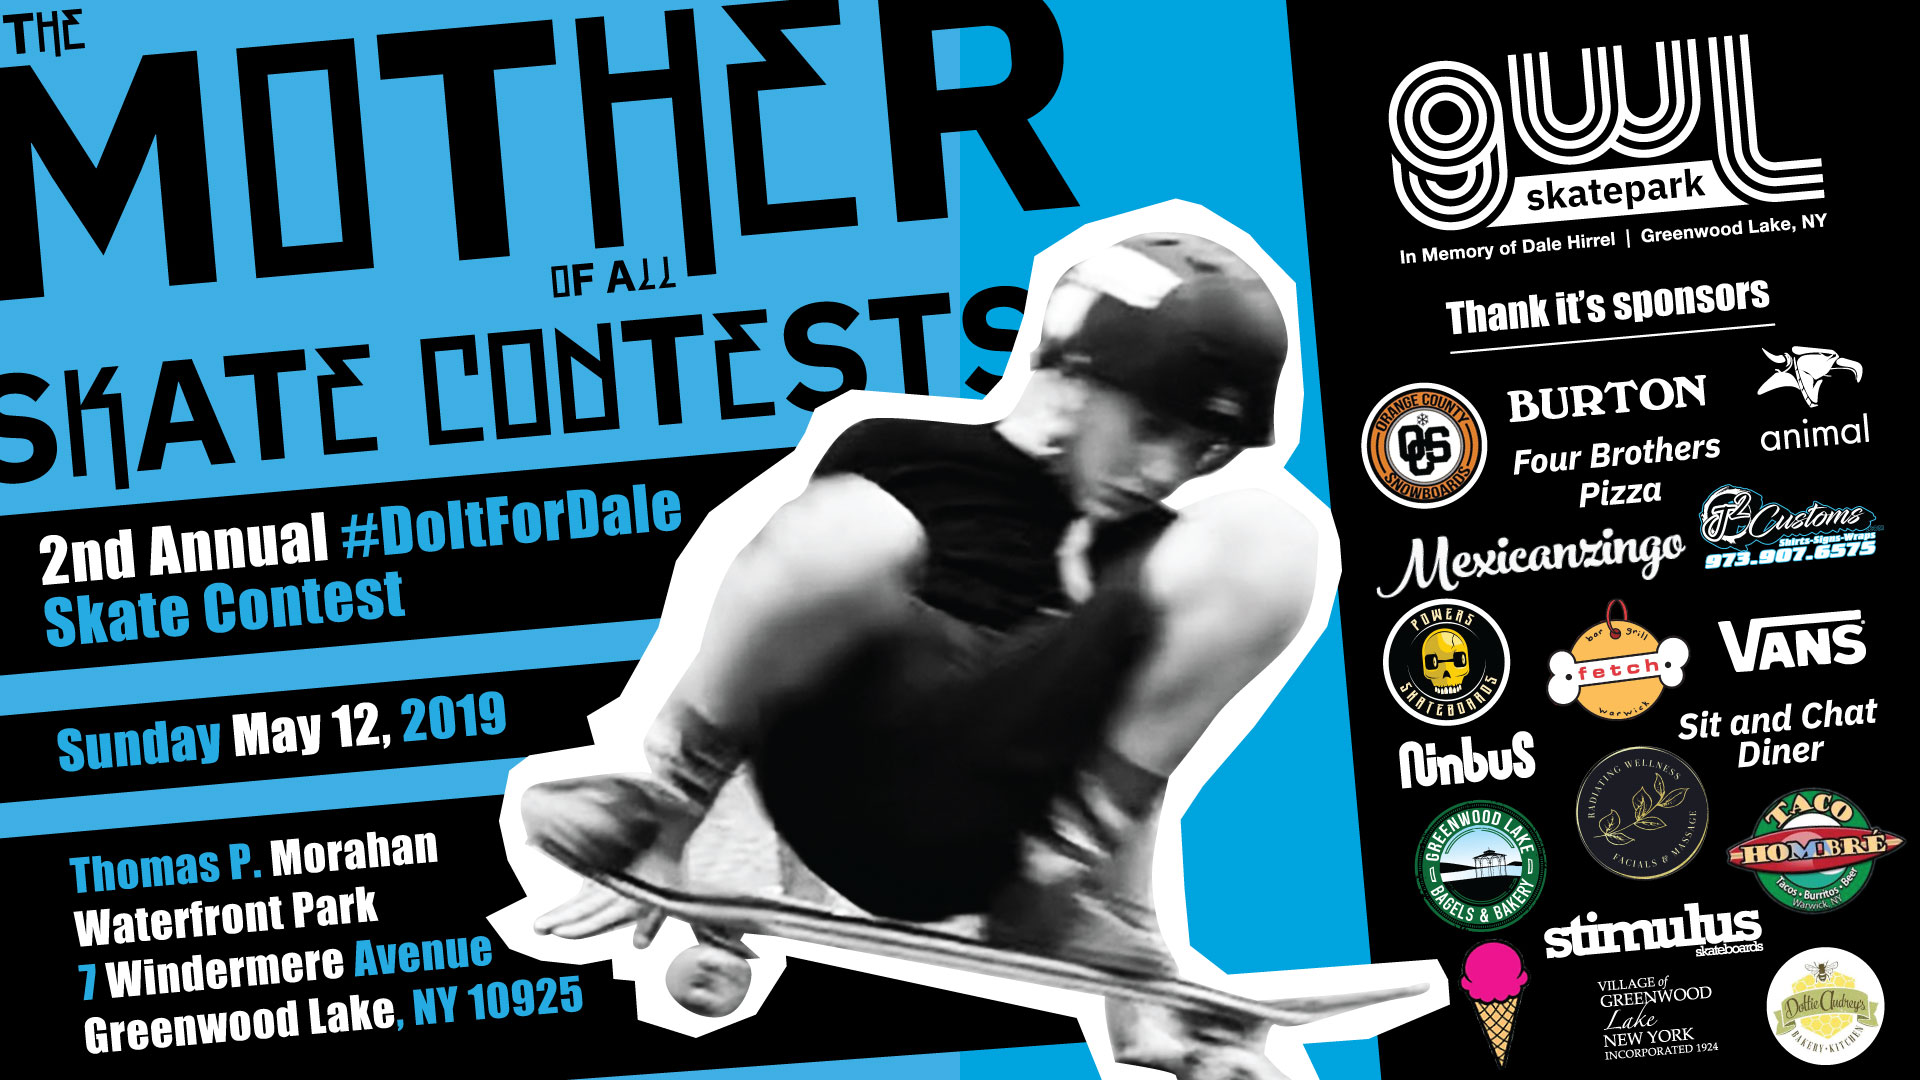 GWLSkatePark Skate Contest, Do It For Dale Skate Contest, Thomas P. Morahan Waterfront Park, Greenwood Lake NY